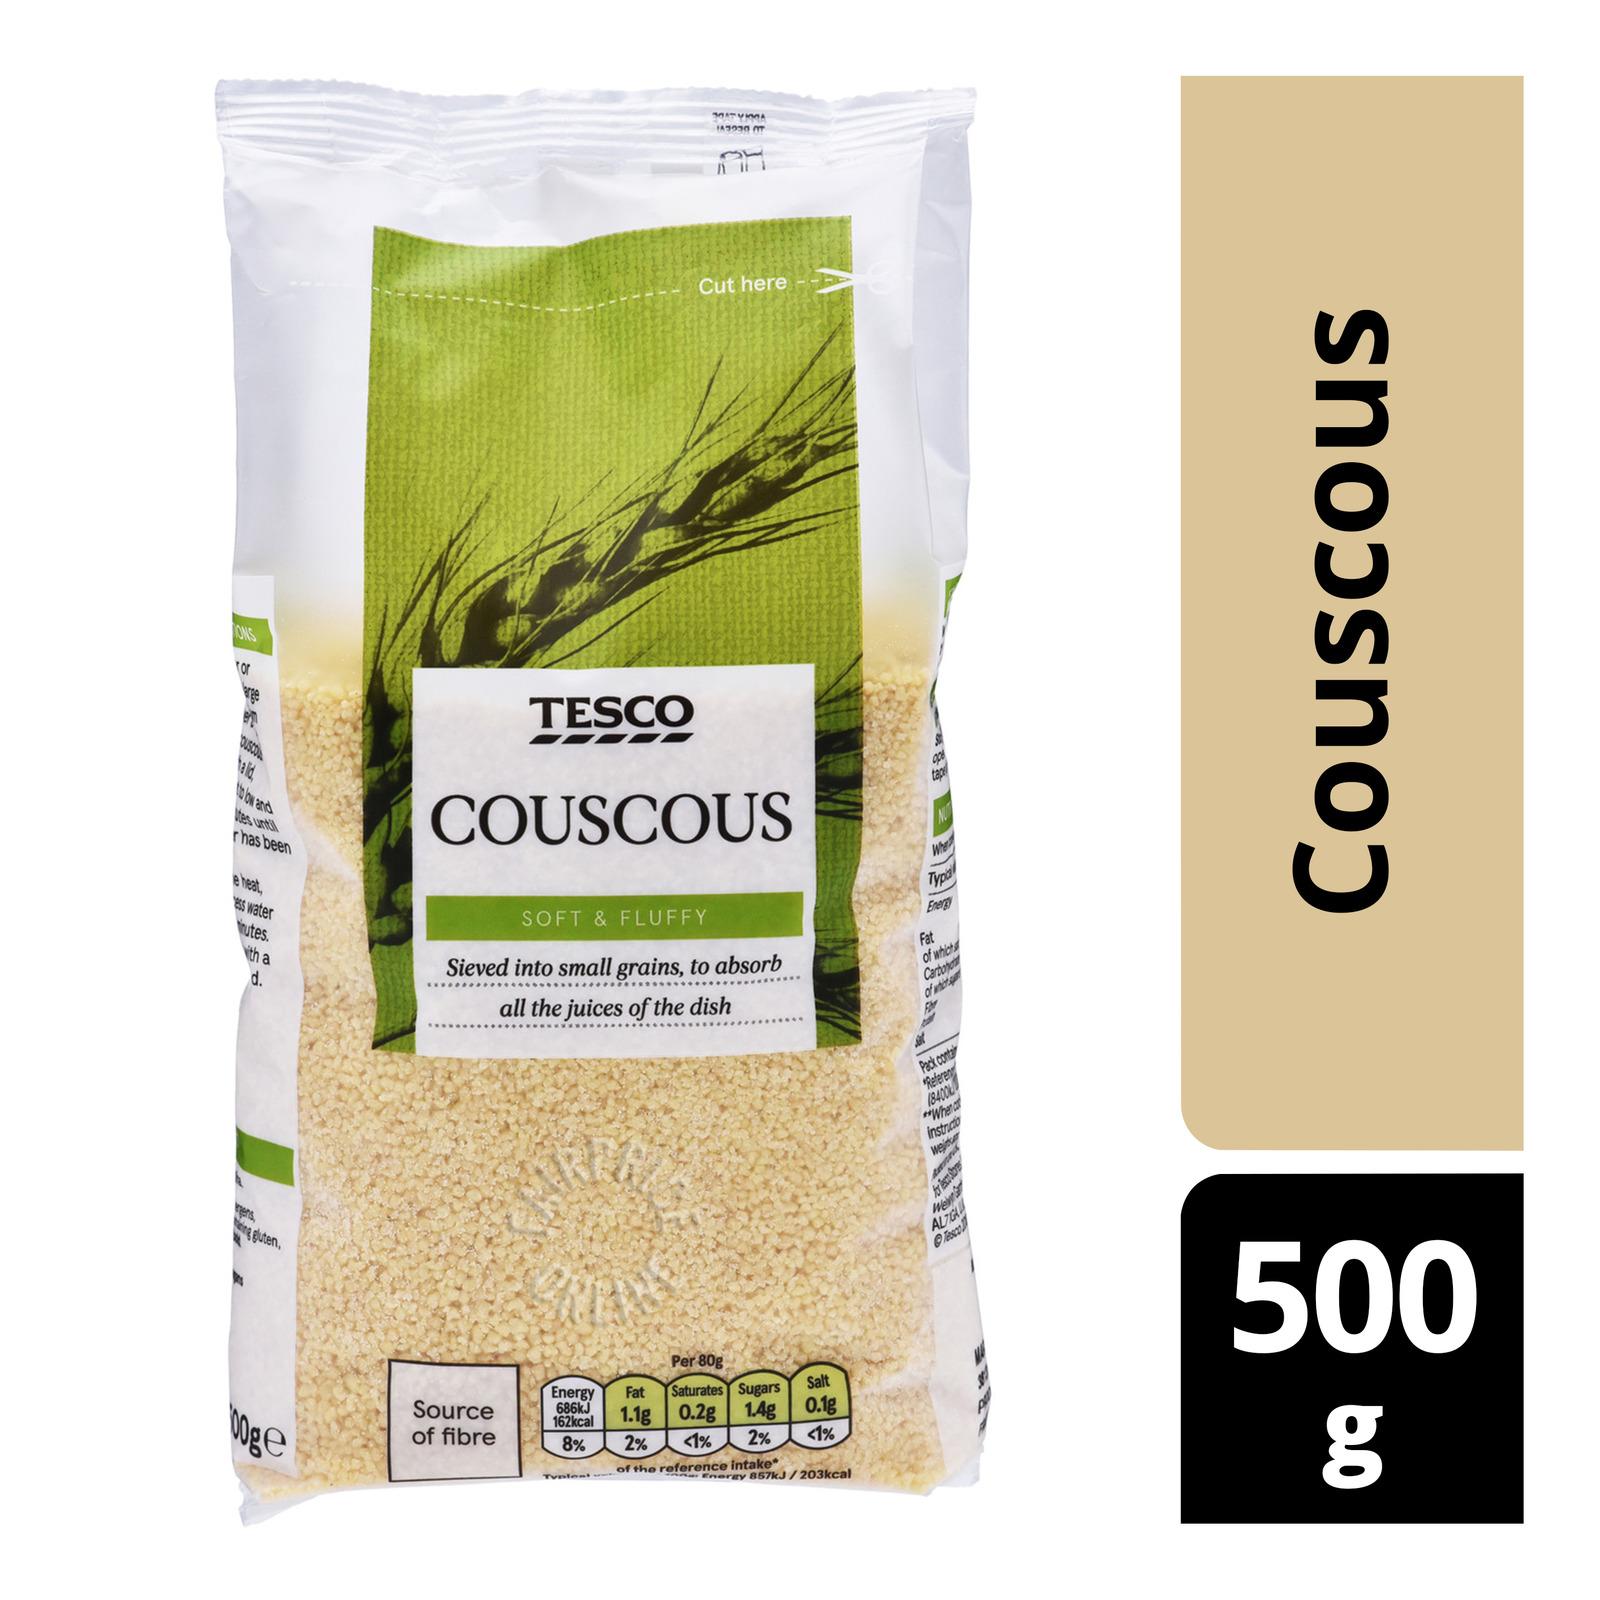 Tesco Couscous